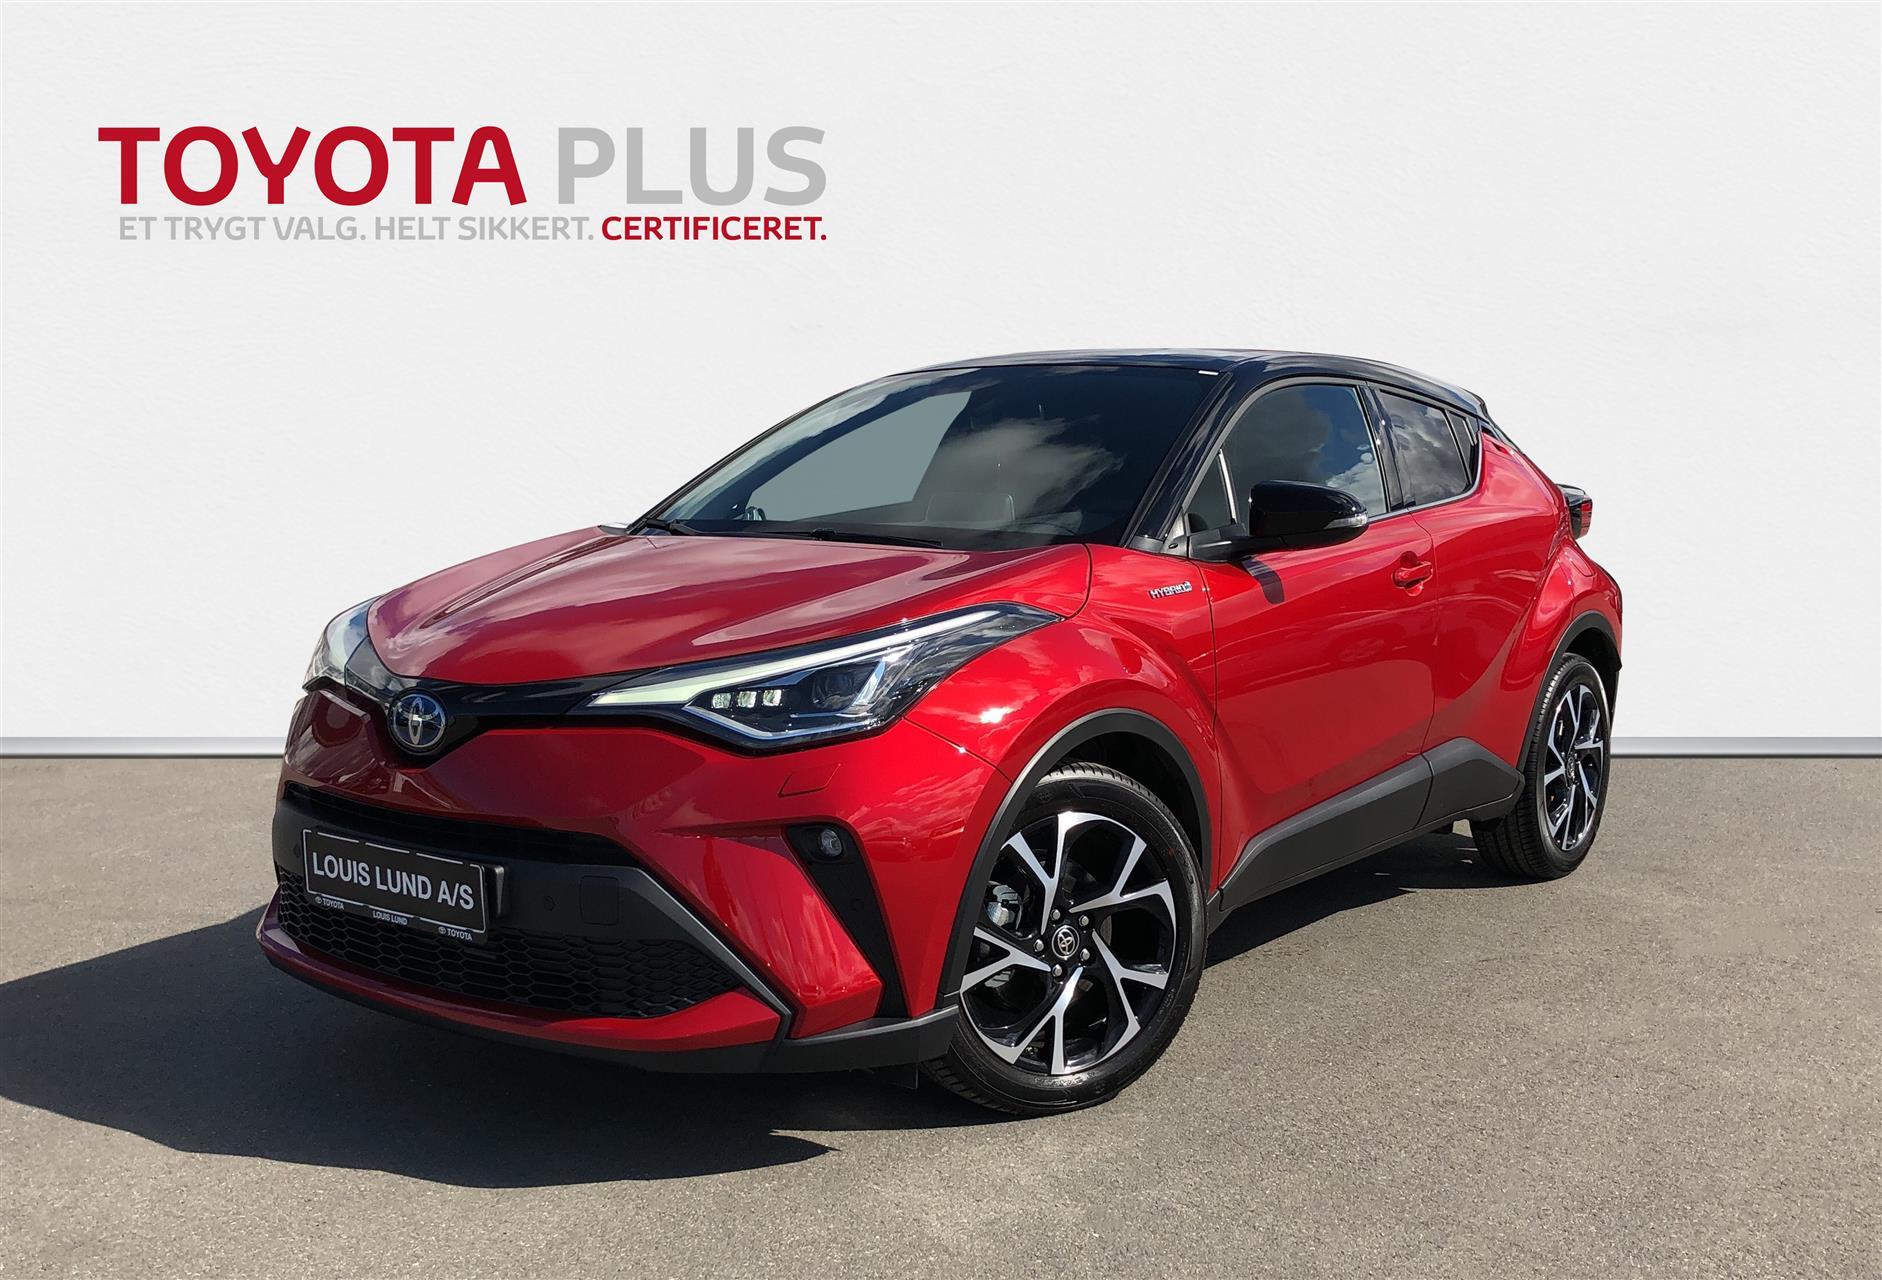 Billede af Toyota C-HR 2,0 Hybrid C-LUB Premium Multidrive S 184HK 5d Aut.